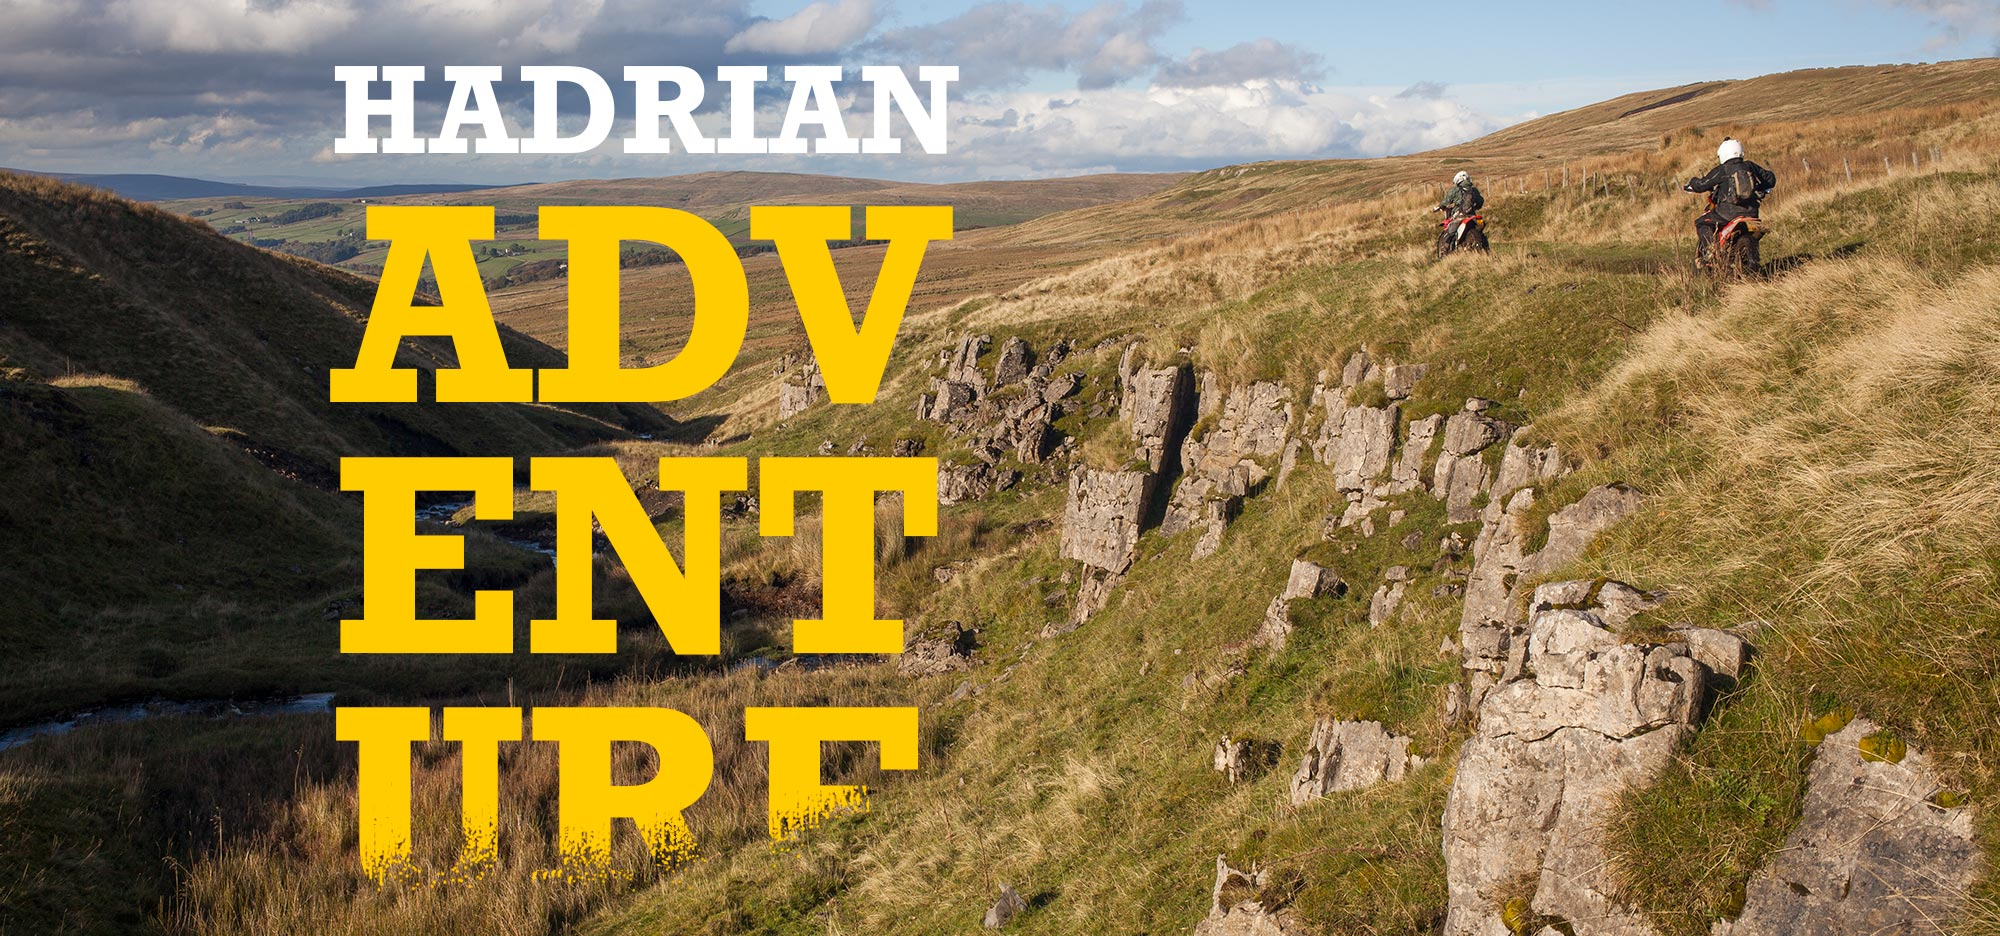 hadrian-adventure-title-04